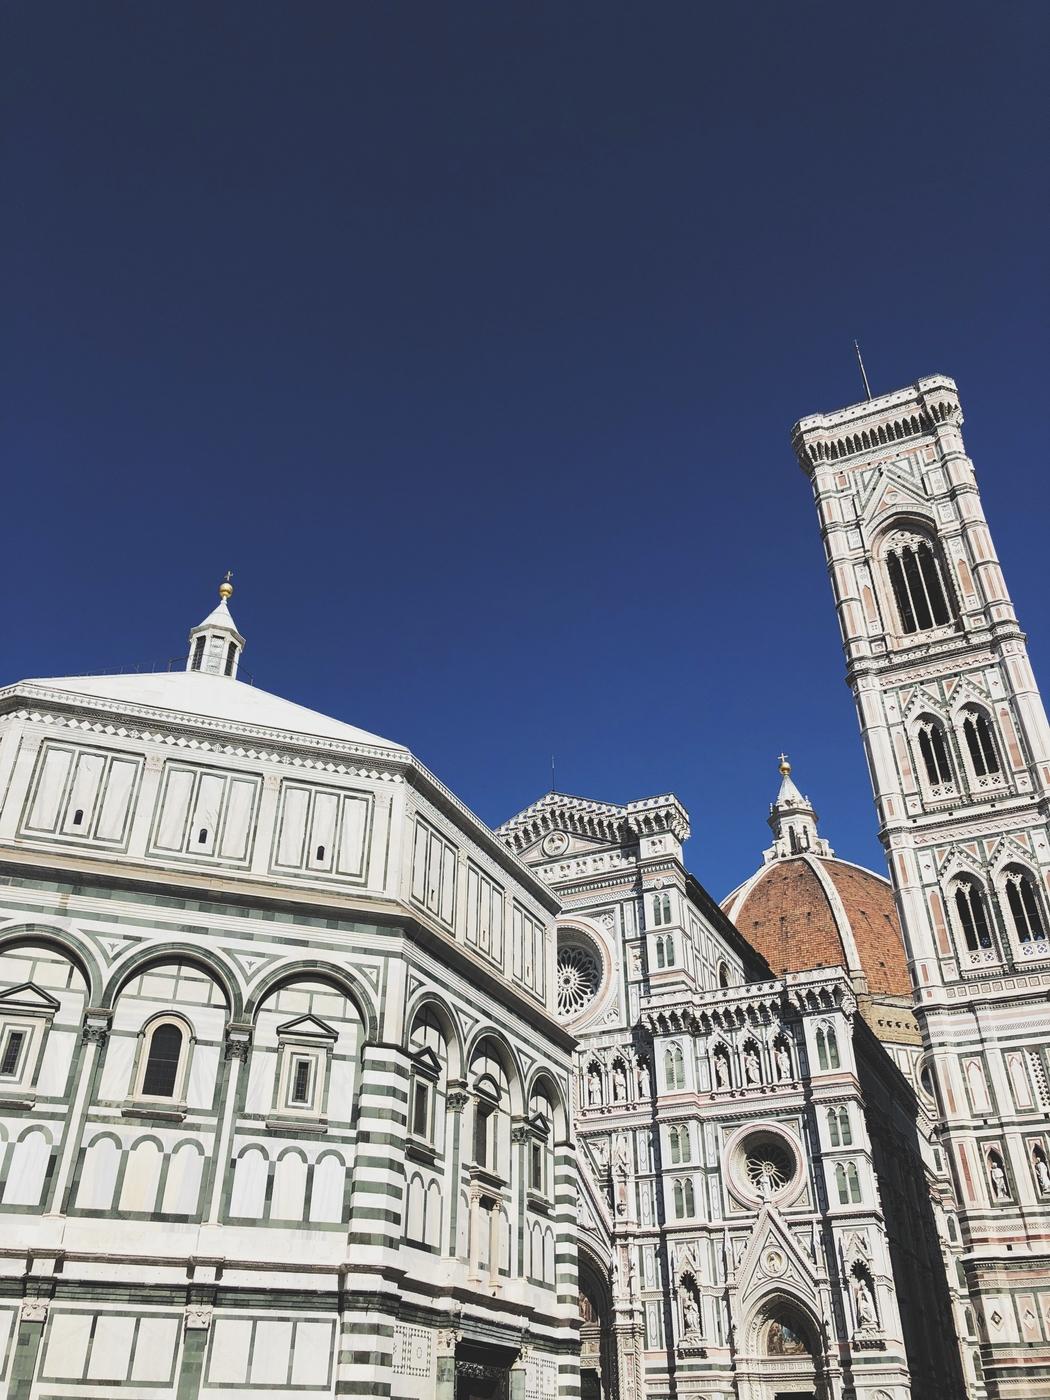 Ciao, Firenze